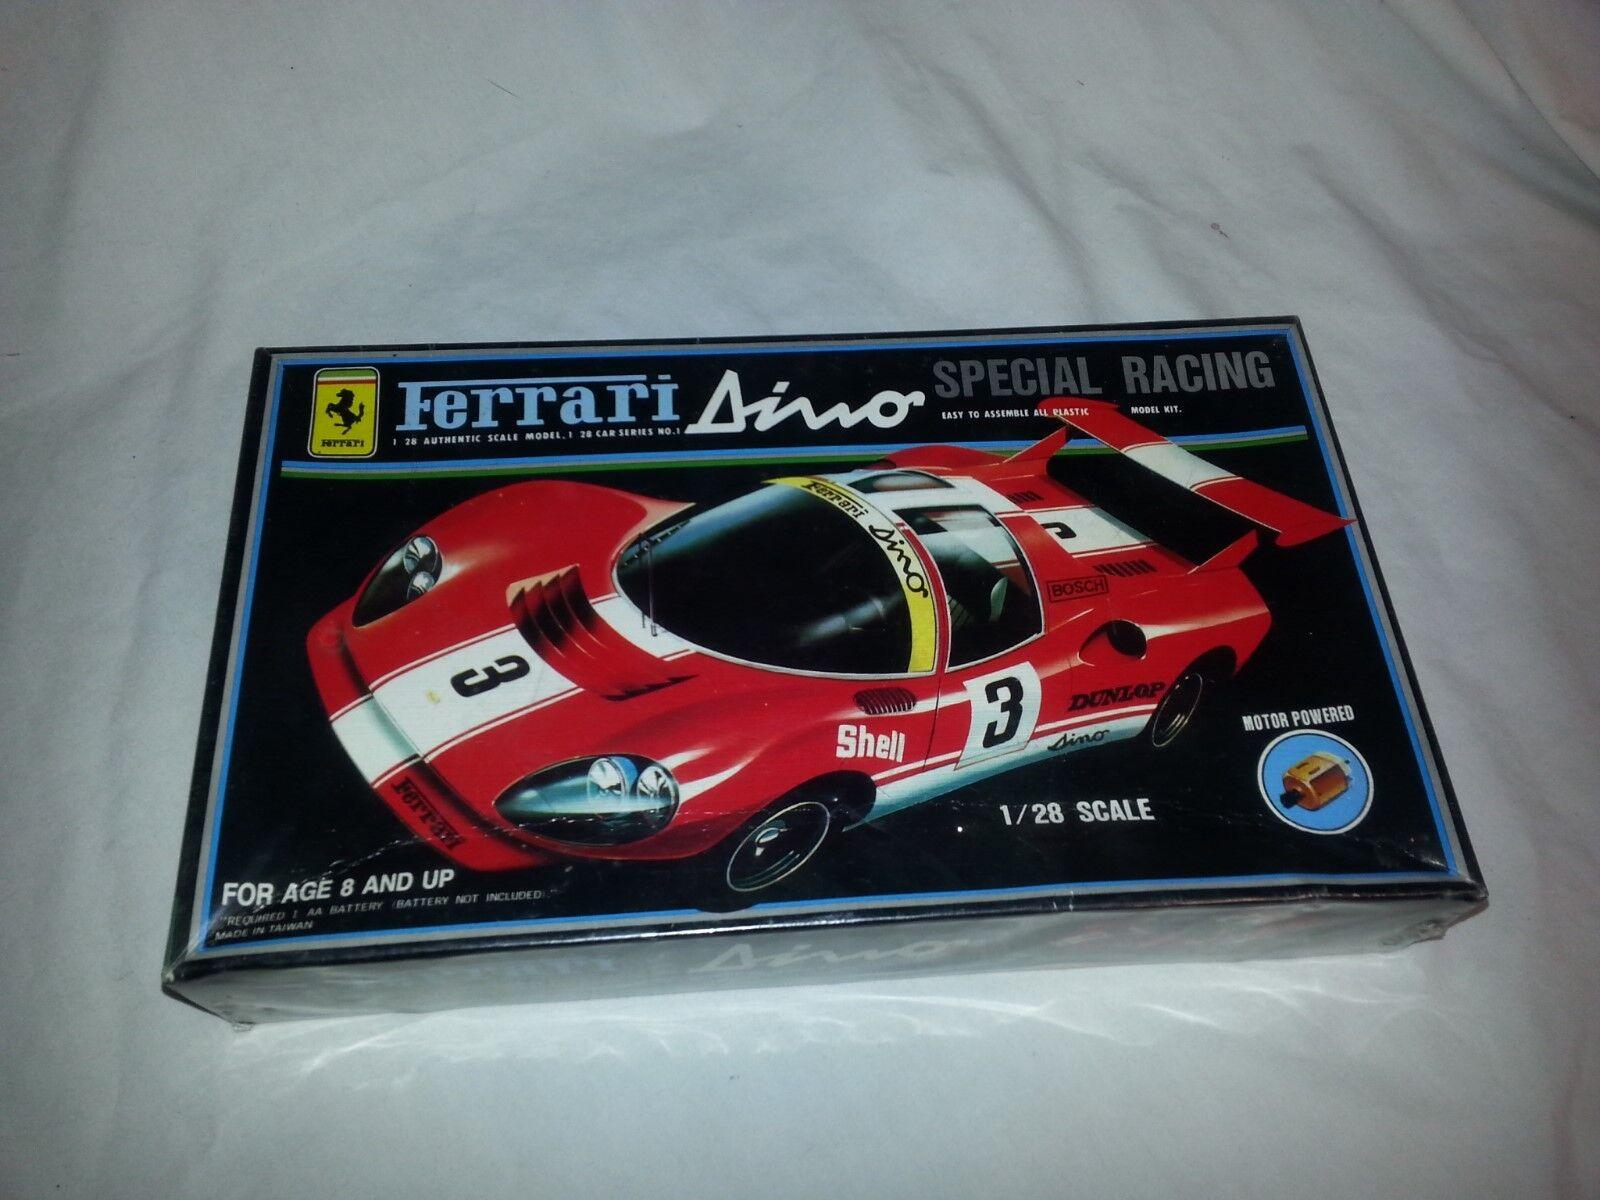 Ferrari dino special - modell - 1   28 modell, motor angetrieben